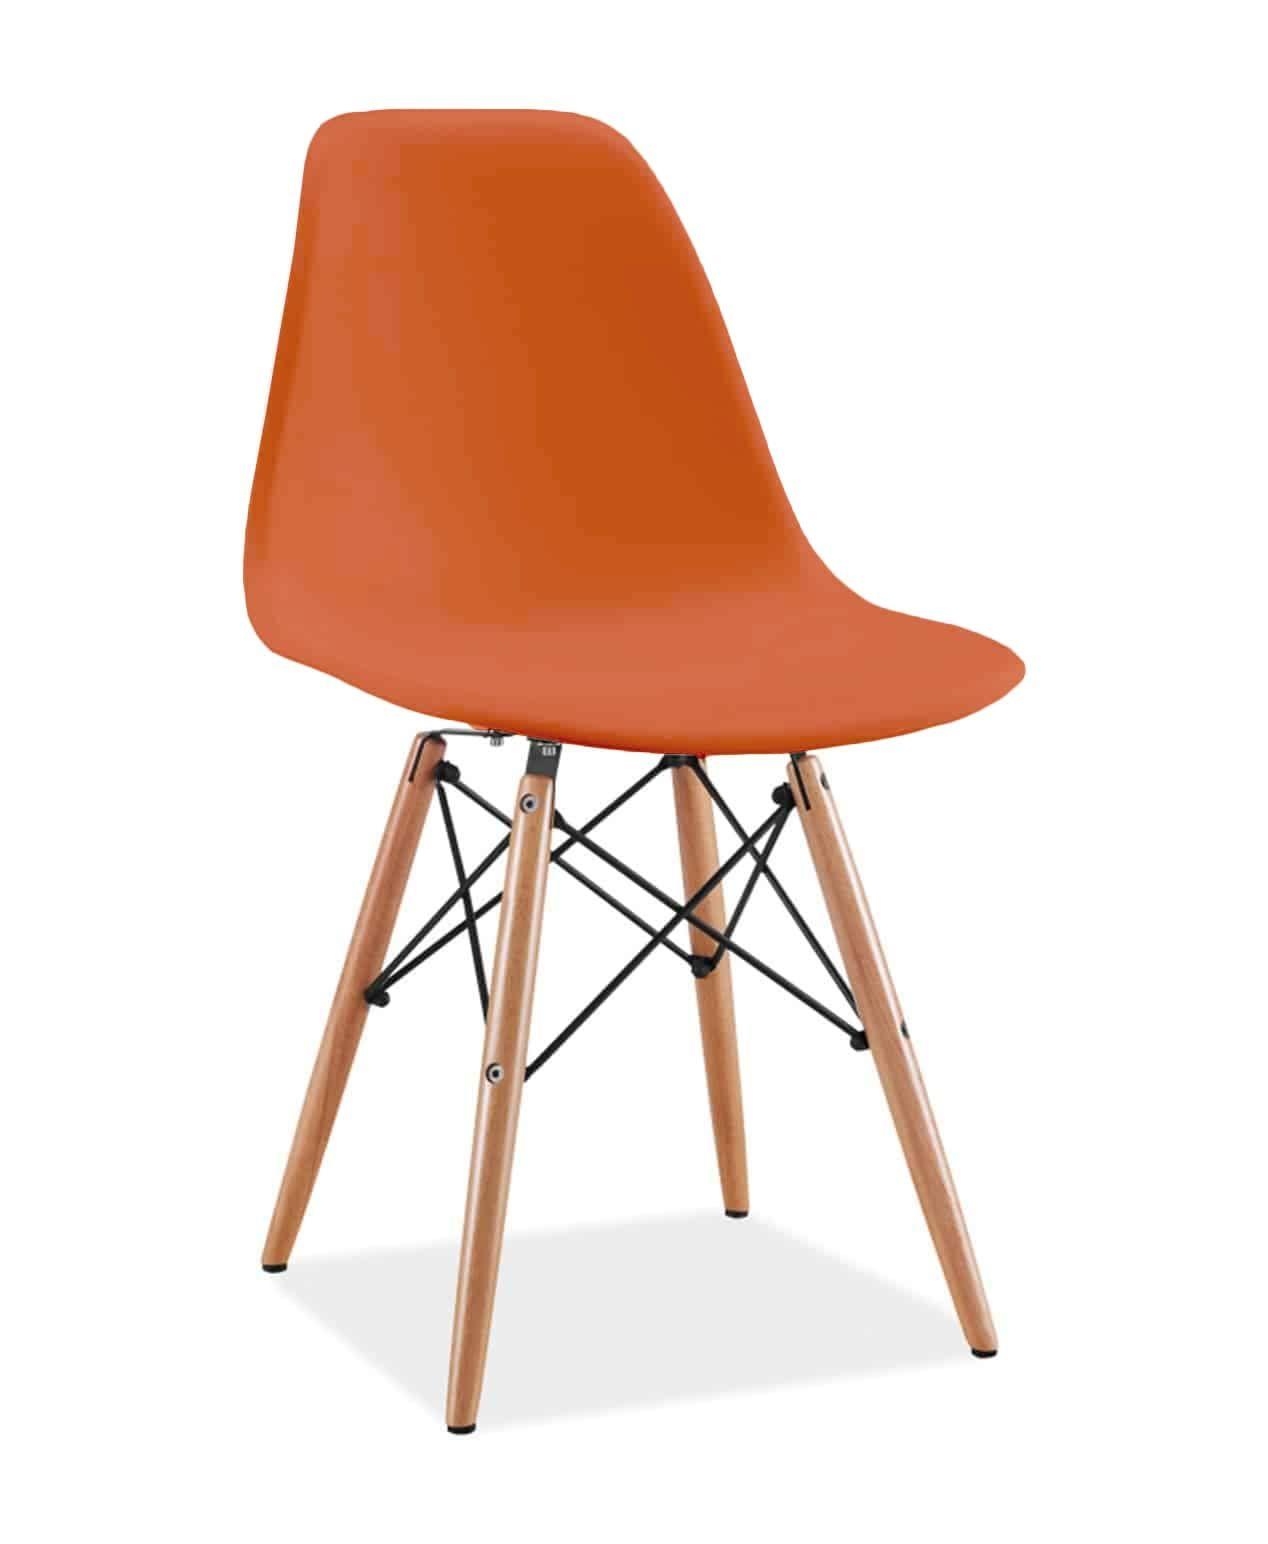 dsw-chair-plastic-orange-side